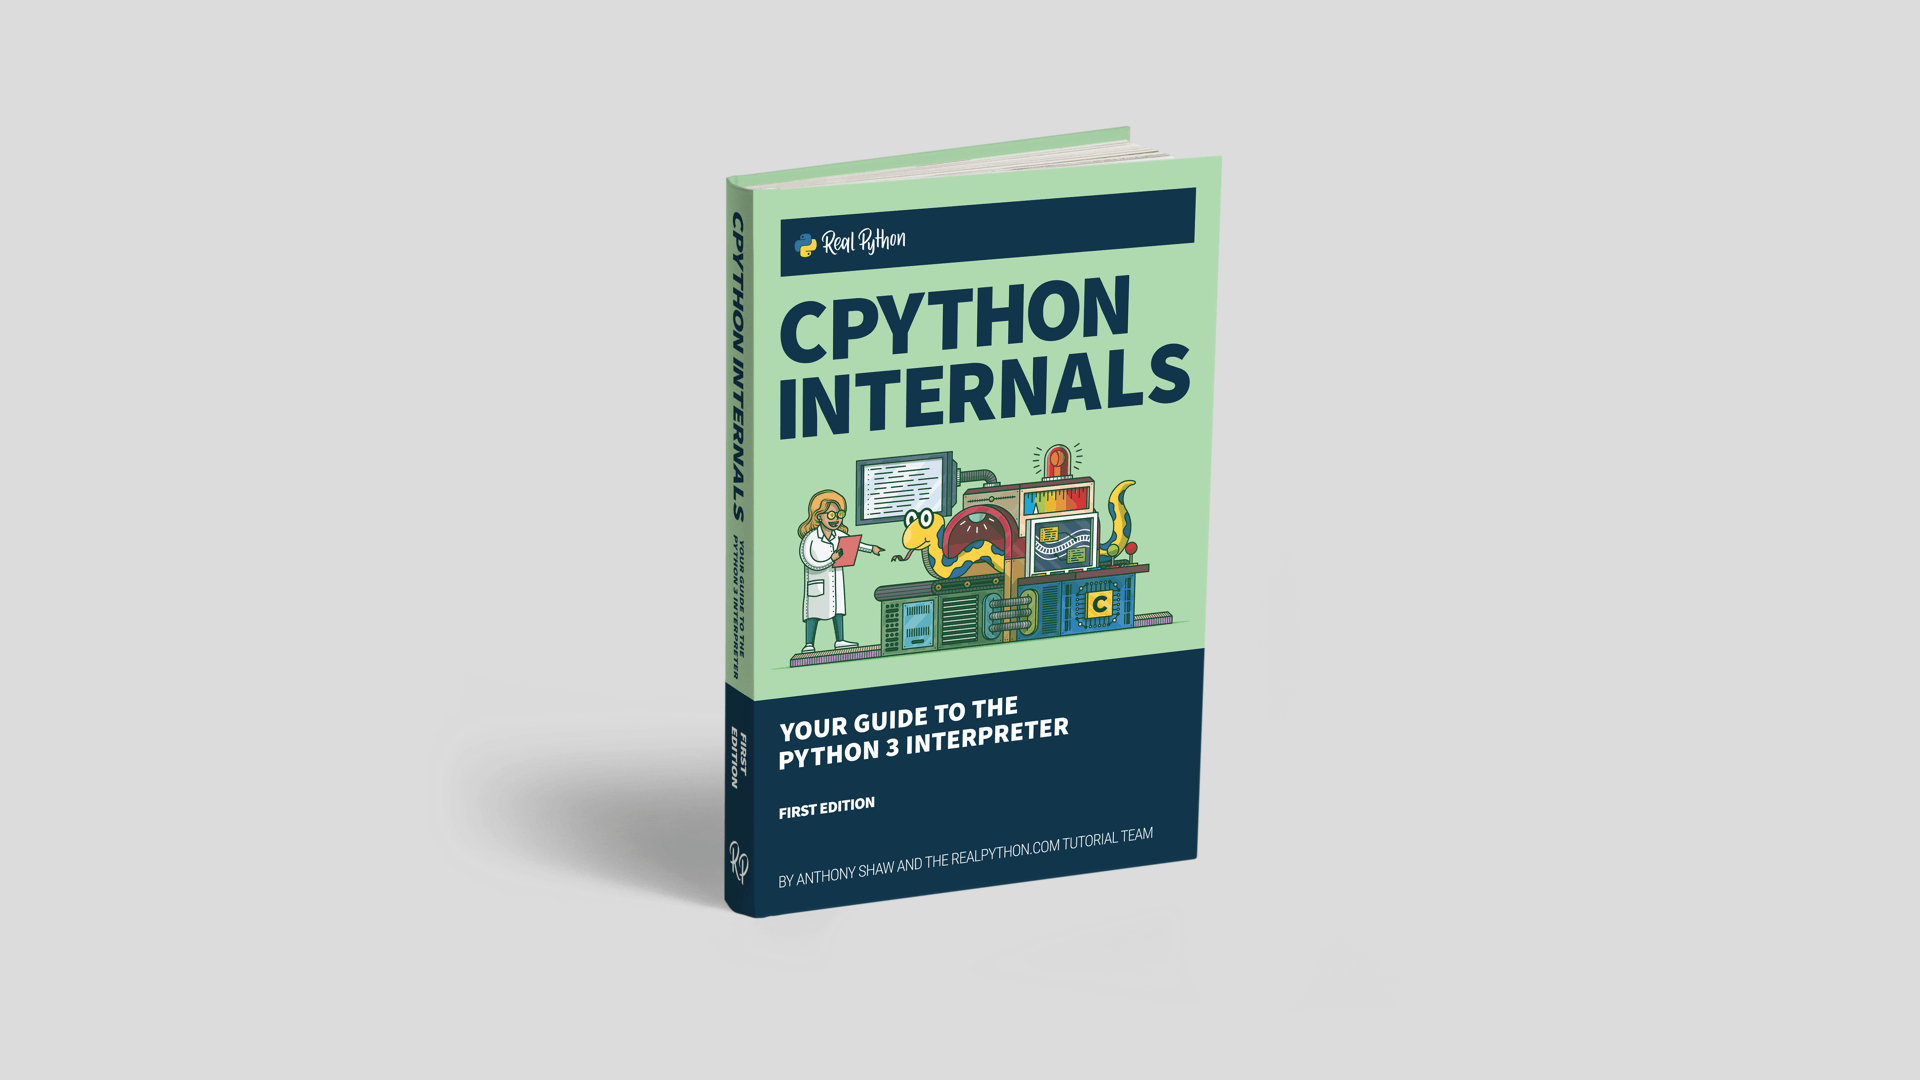 CPython Internals: Your Guide to the Python 3 Interpreter